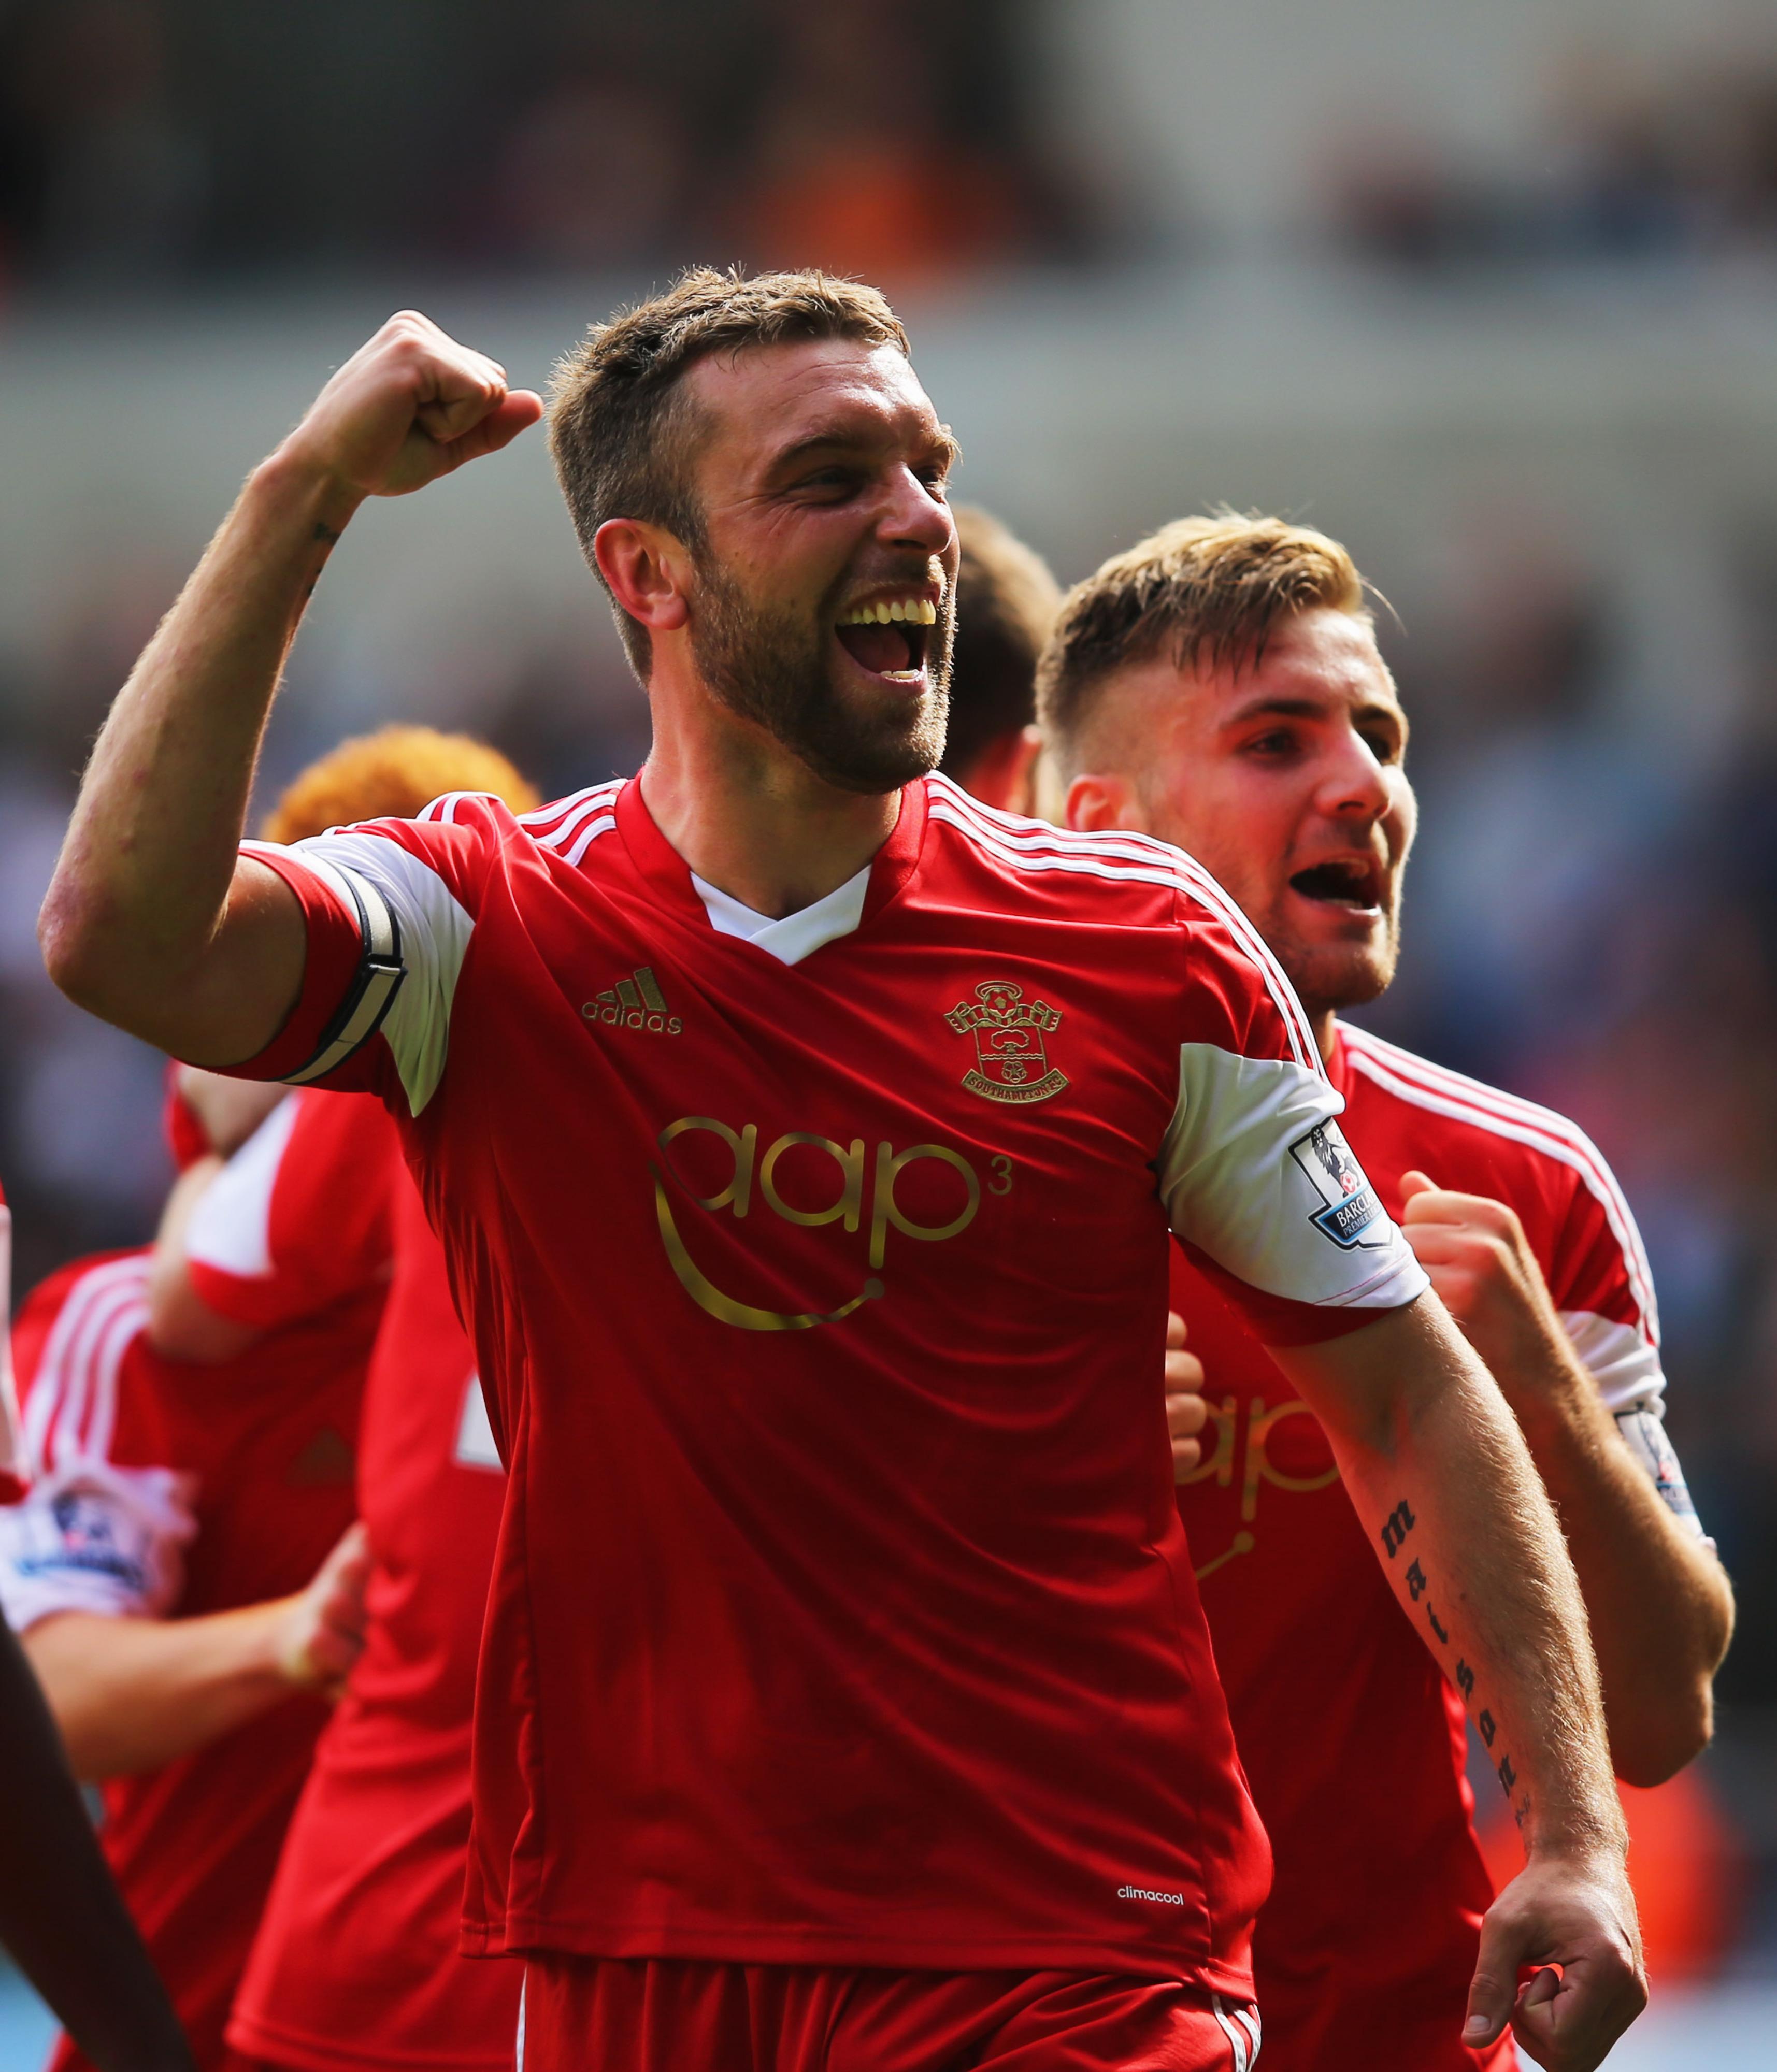 Southampton's Ricky Lambert celebrates last week's winning goal